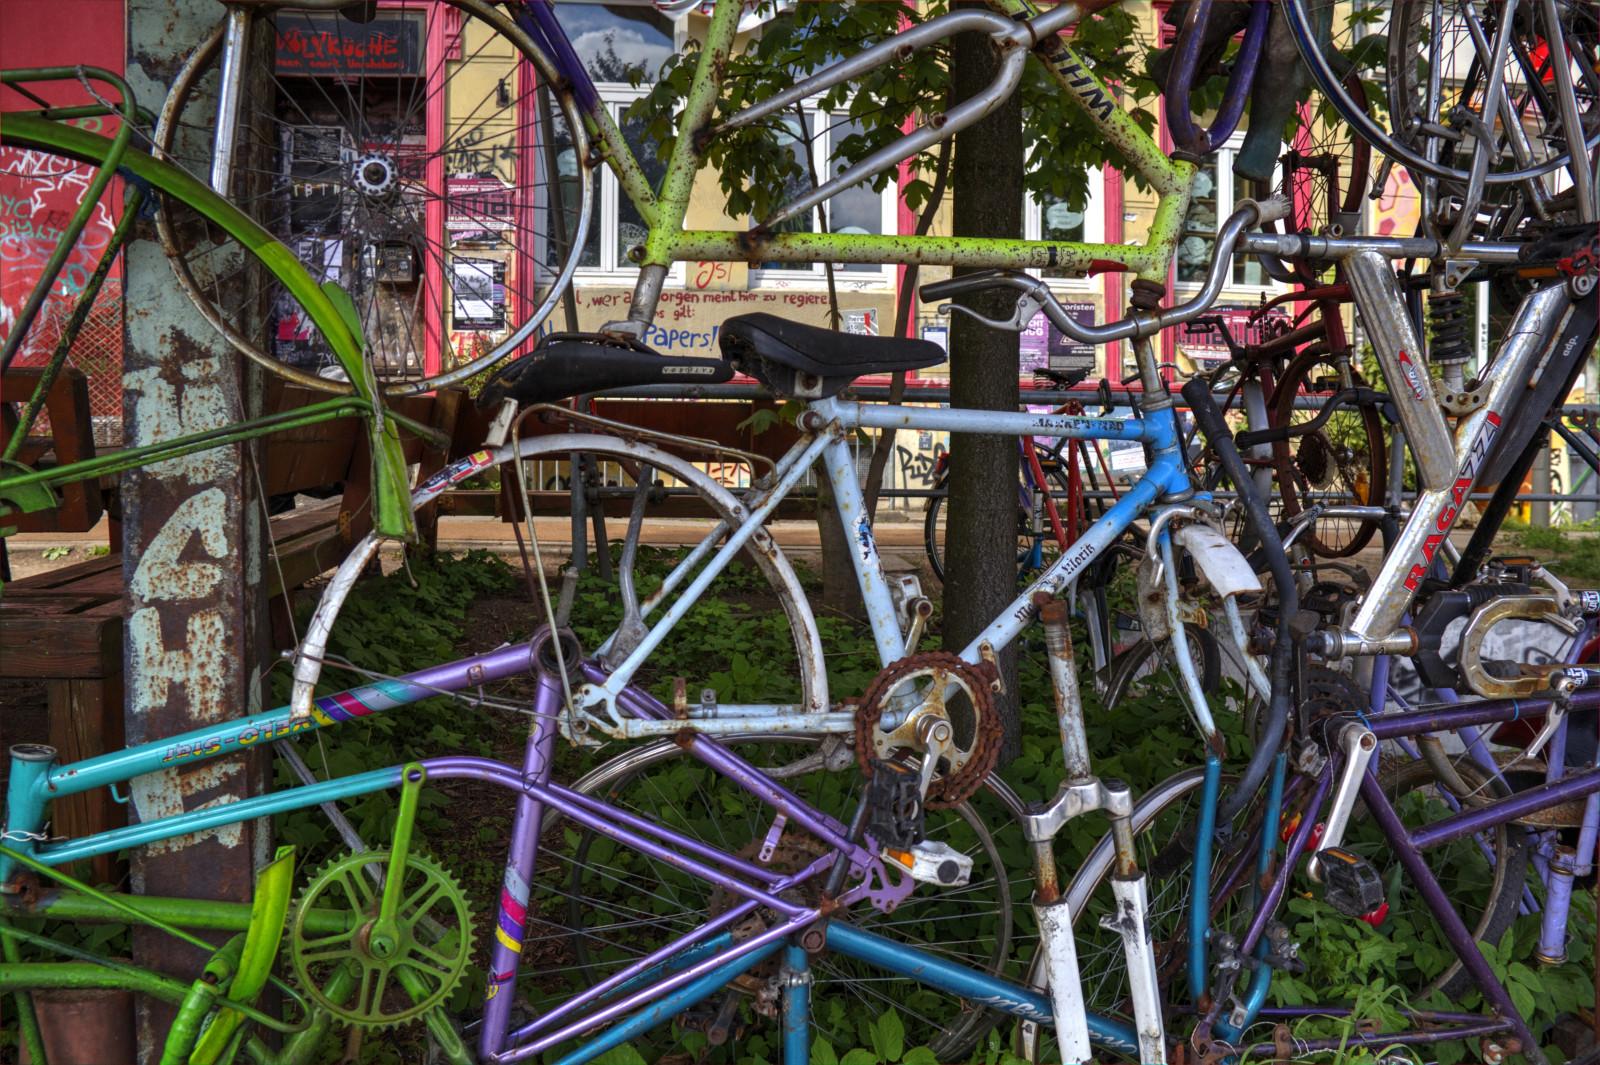 Hintergrundbilder : Fahrrad, Gras, Fahrzeug, Zaun, Hamburg ...